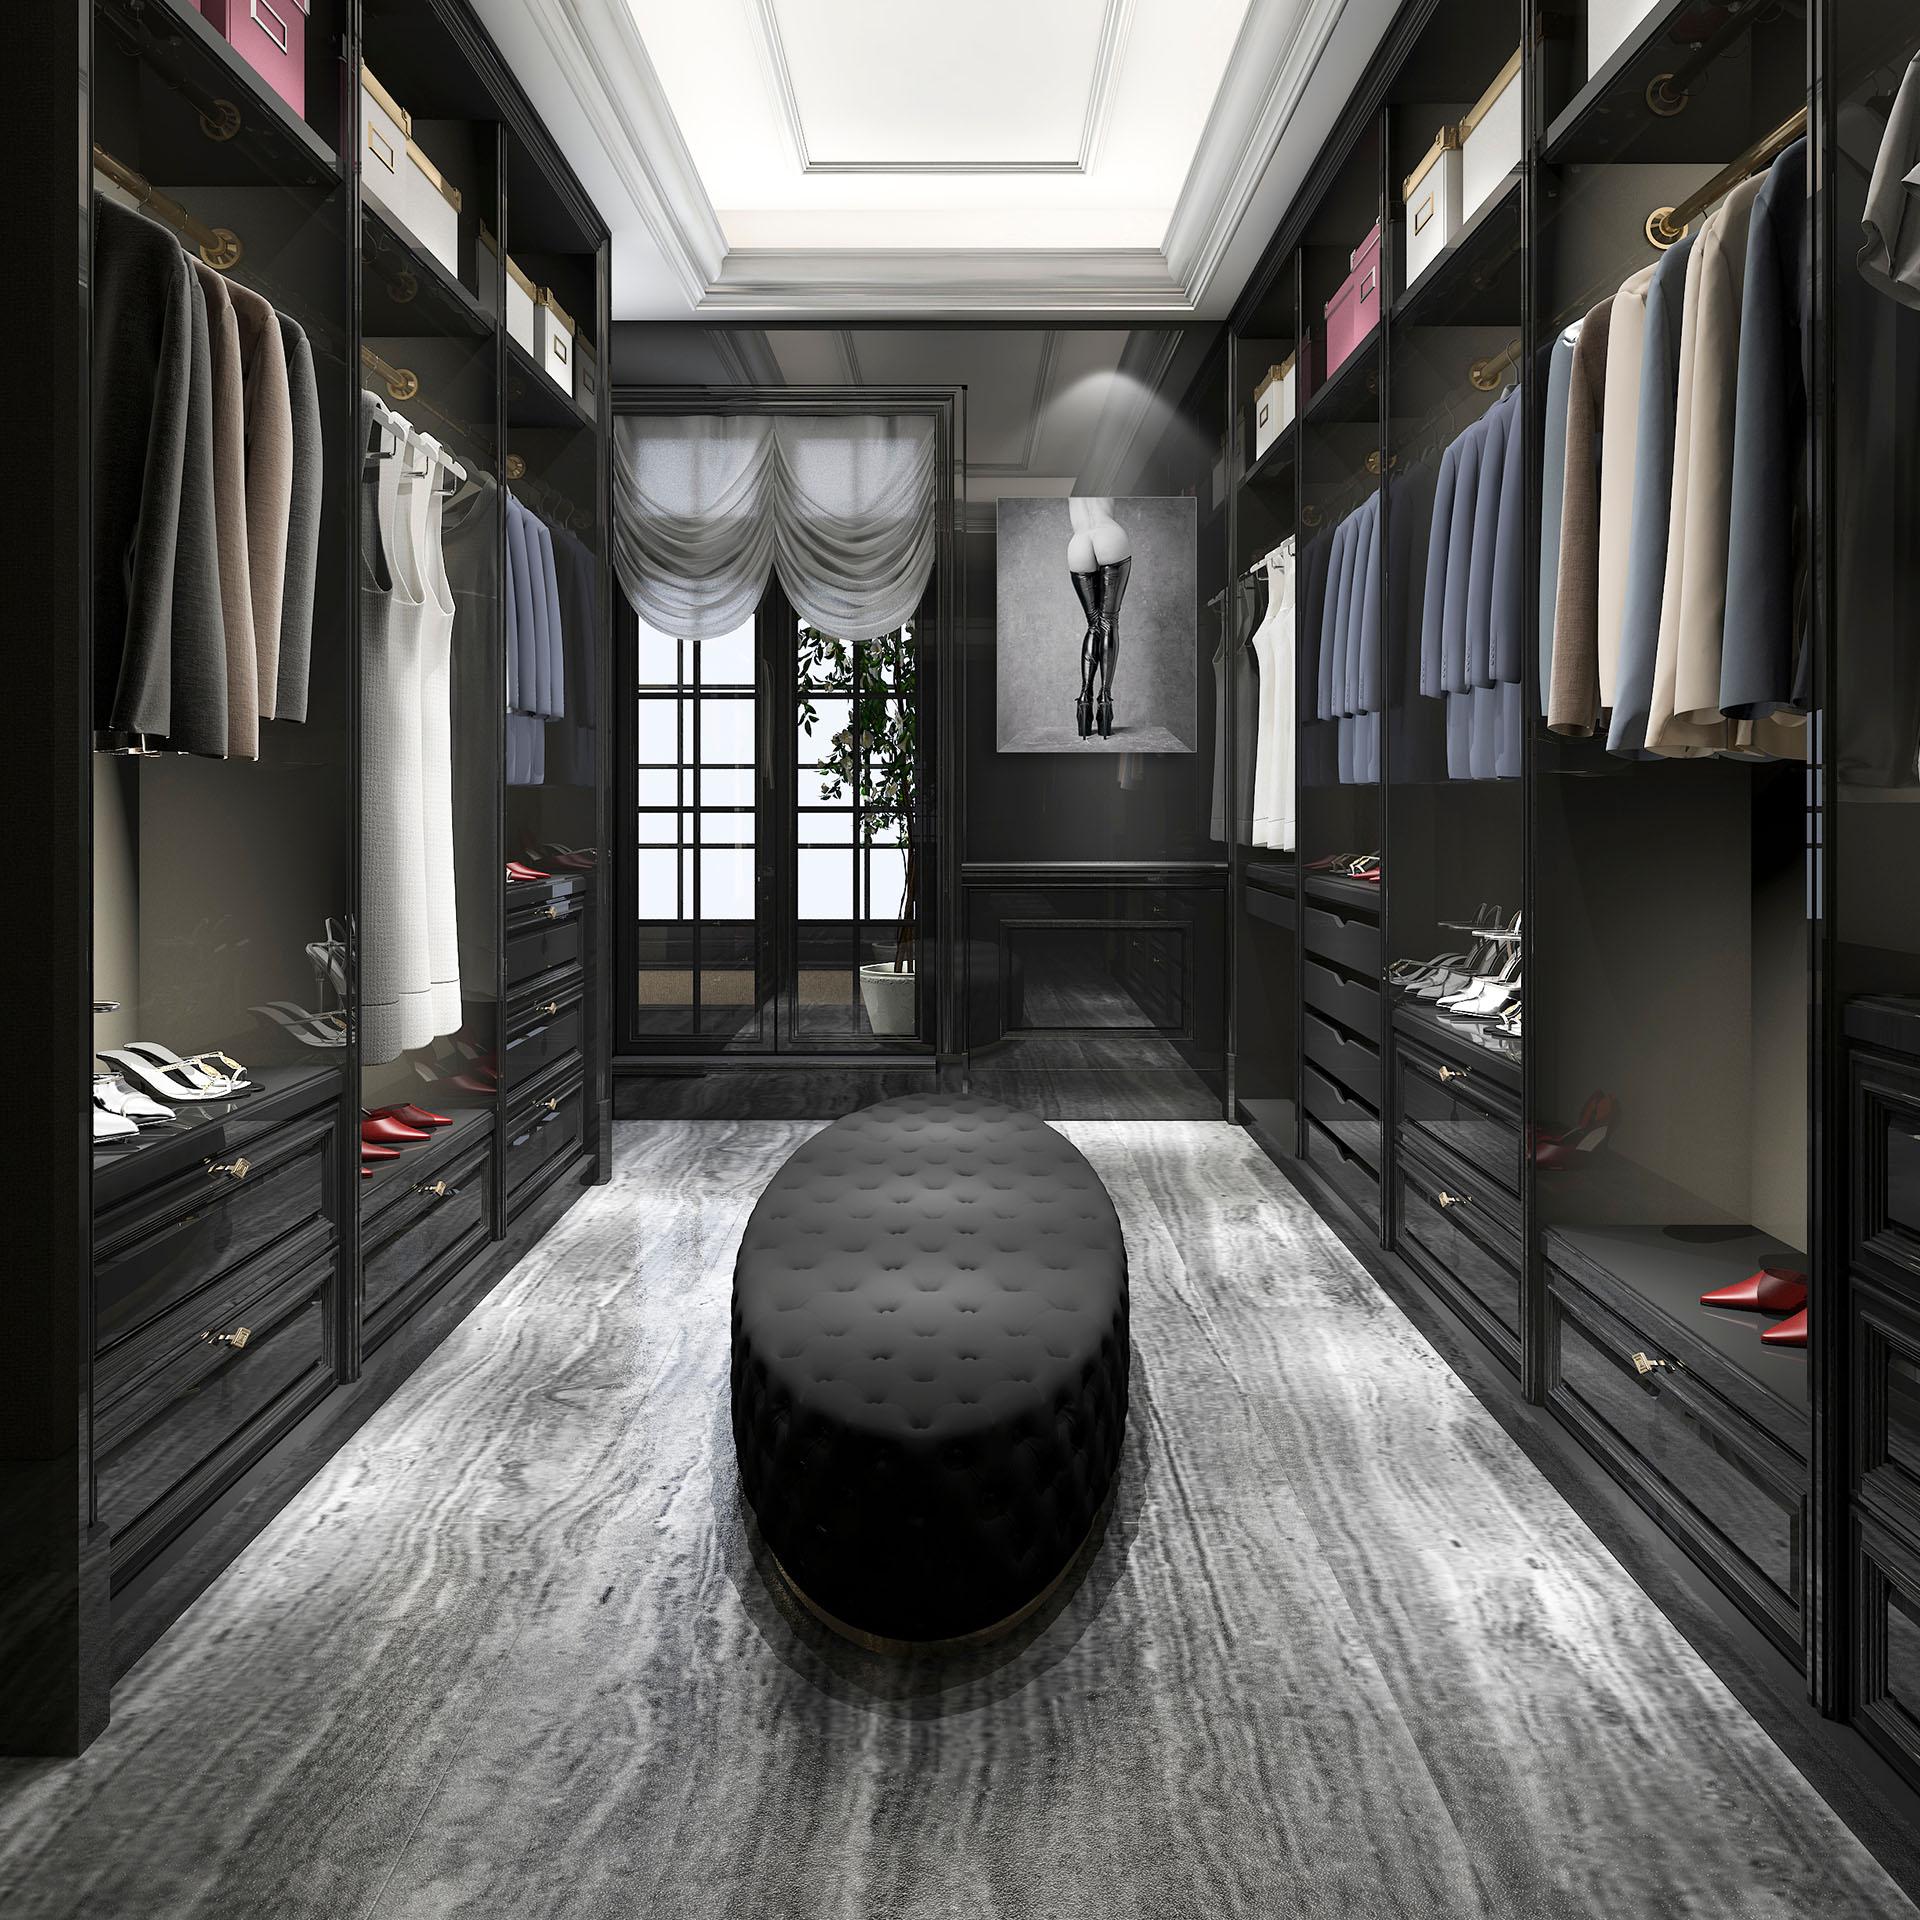 P4999-walk-in-closet-wall-art